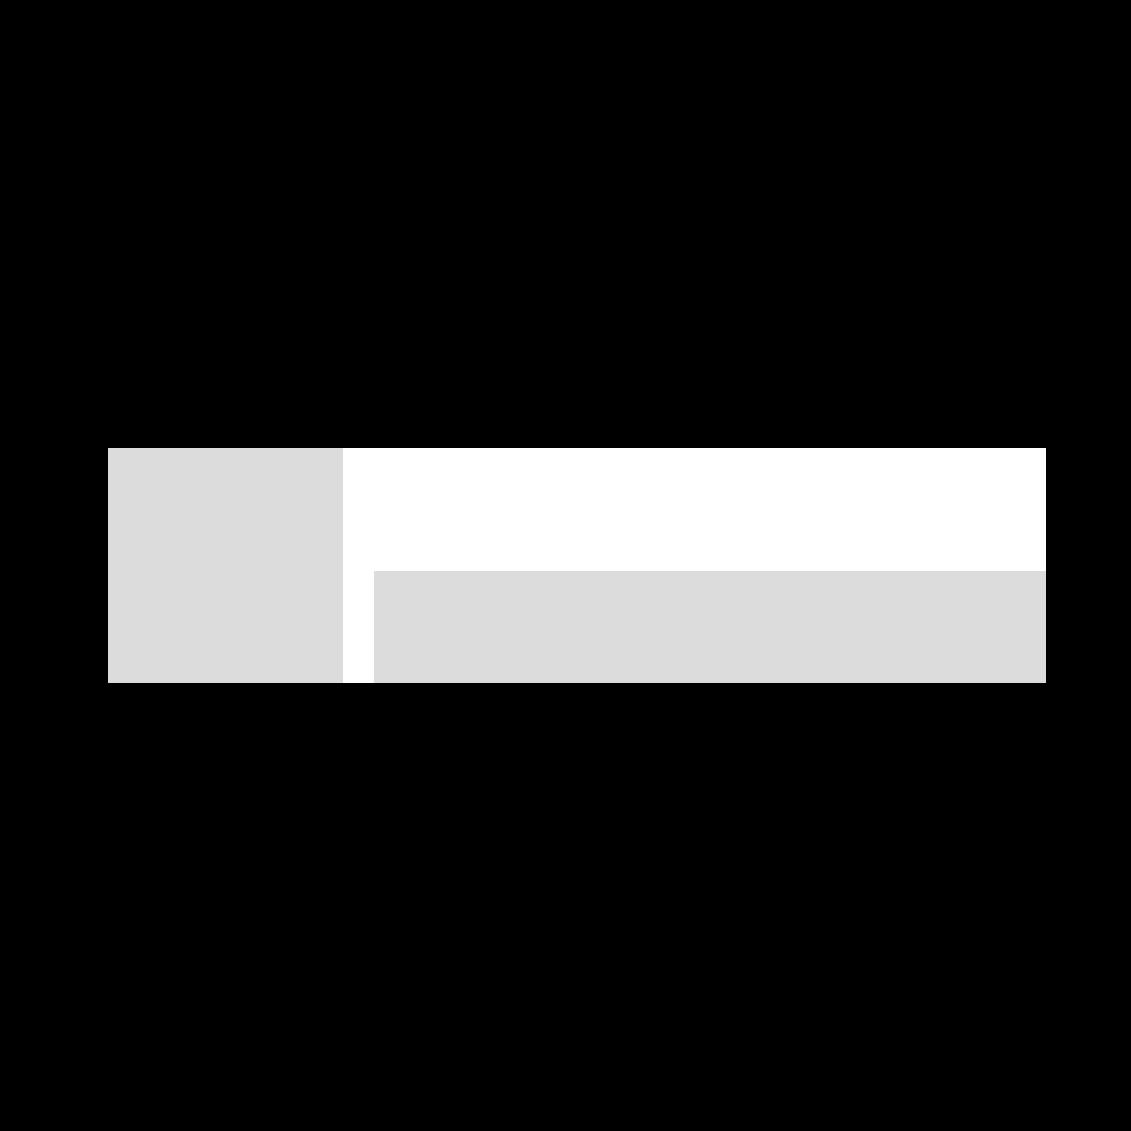 PlatformVisions